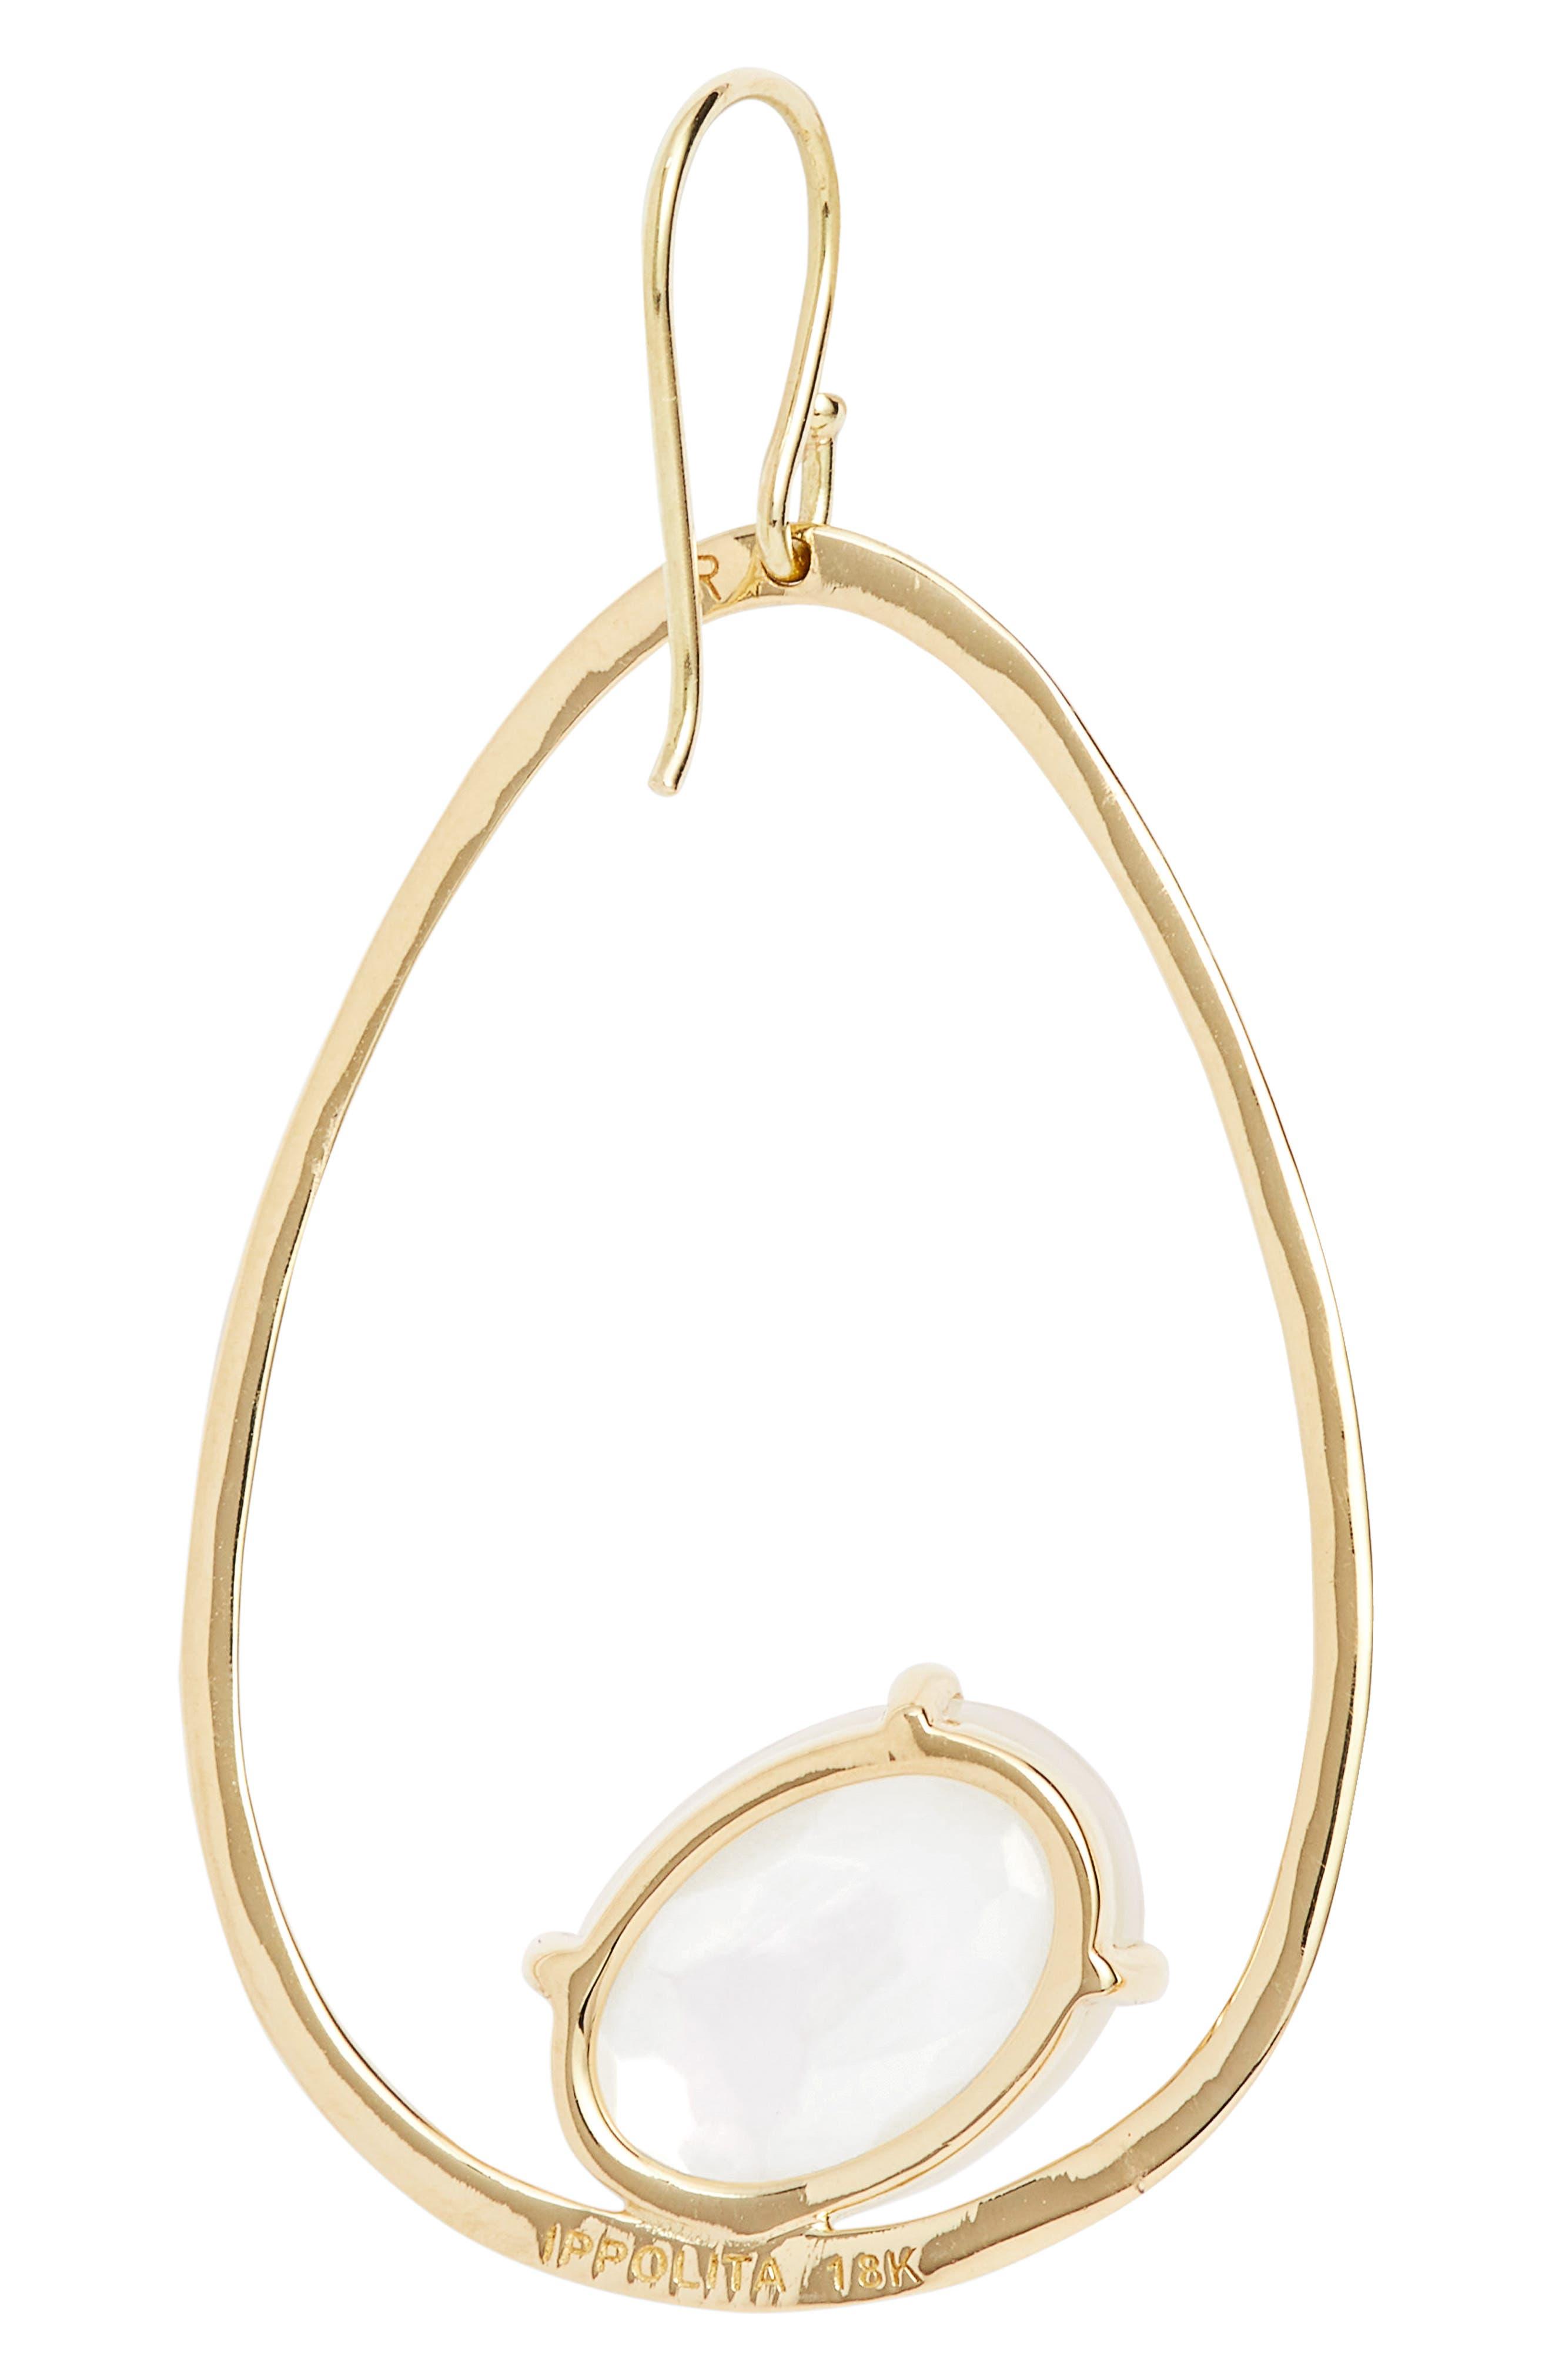 Rock Candy 18K Gold Large Drop Earrings,                             Alternate thumbnail 3, color,                             106